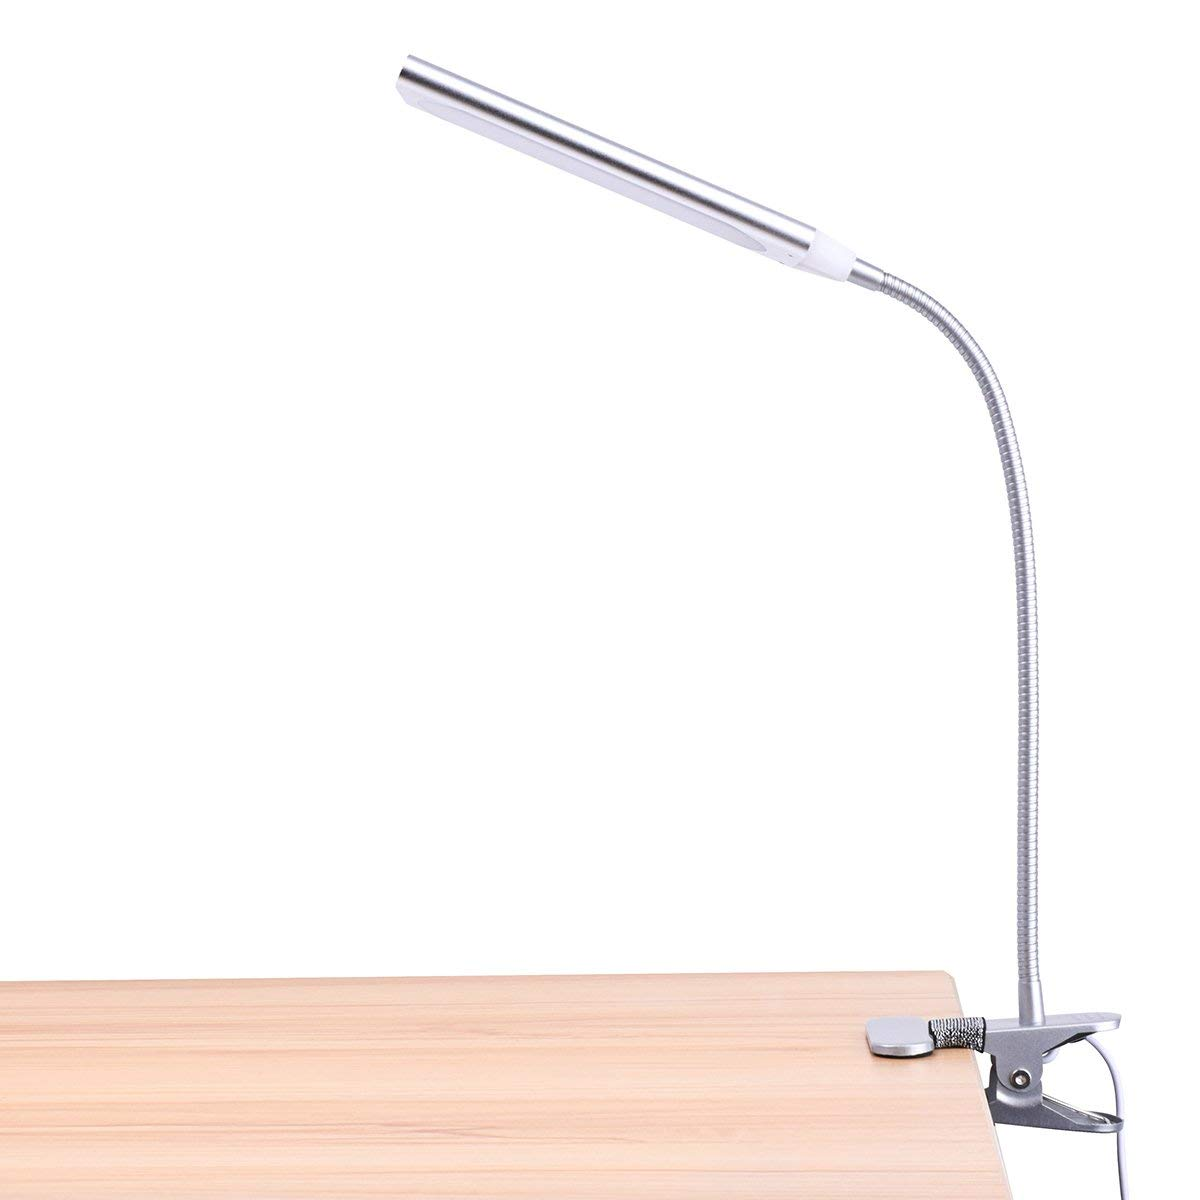 Clip on Light//Desk Lamp USB 3 Color Clip 8W Led Clip Lamp with 11 Brightness